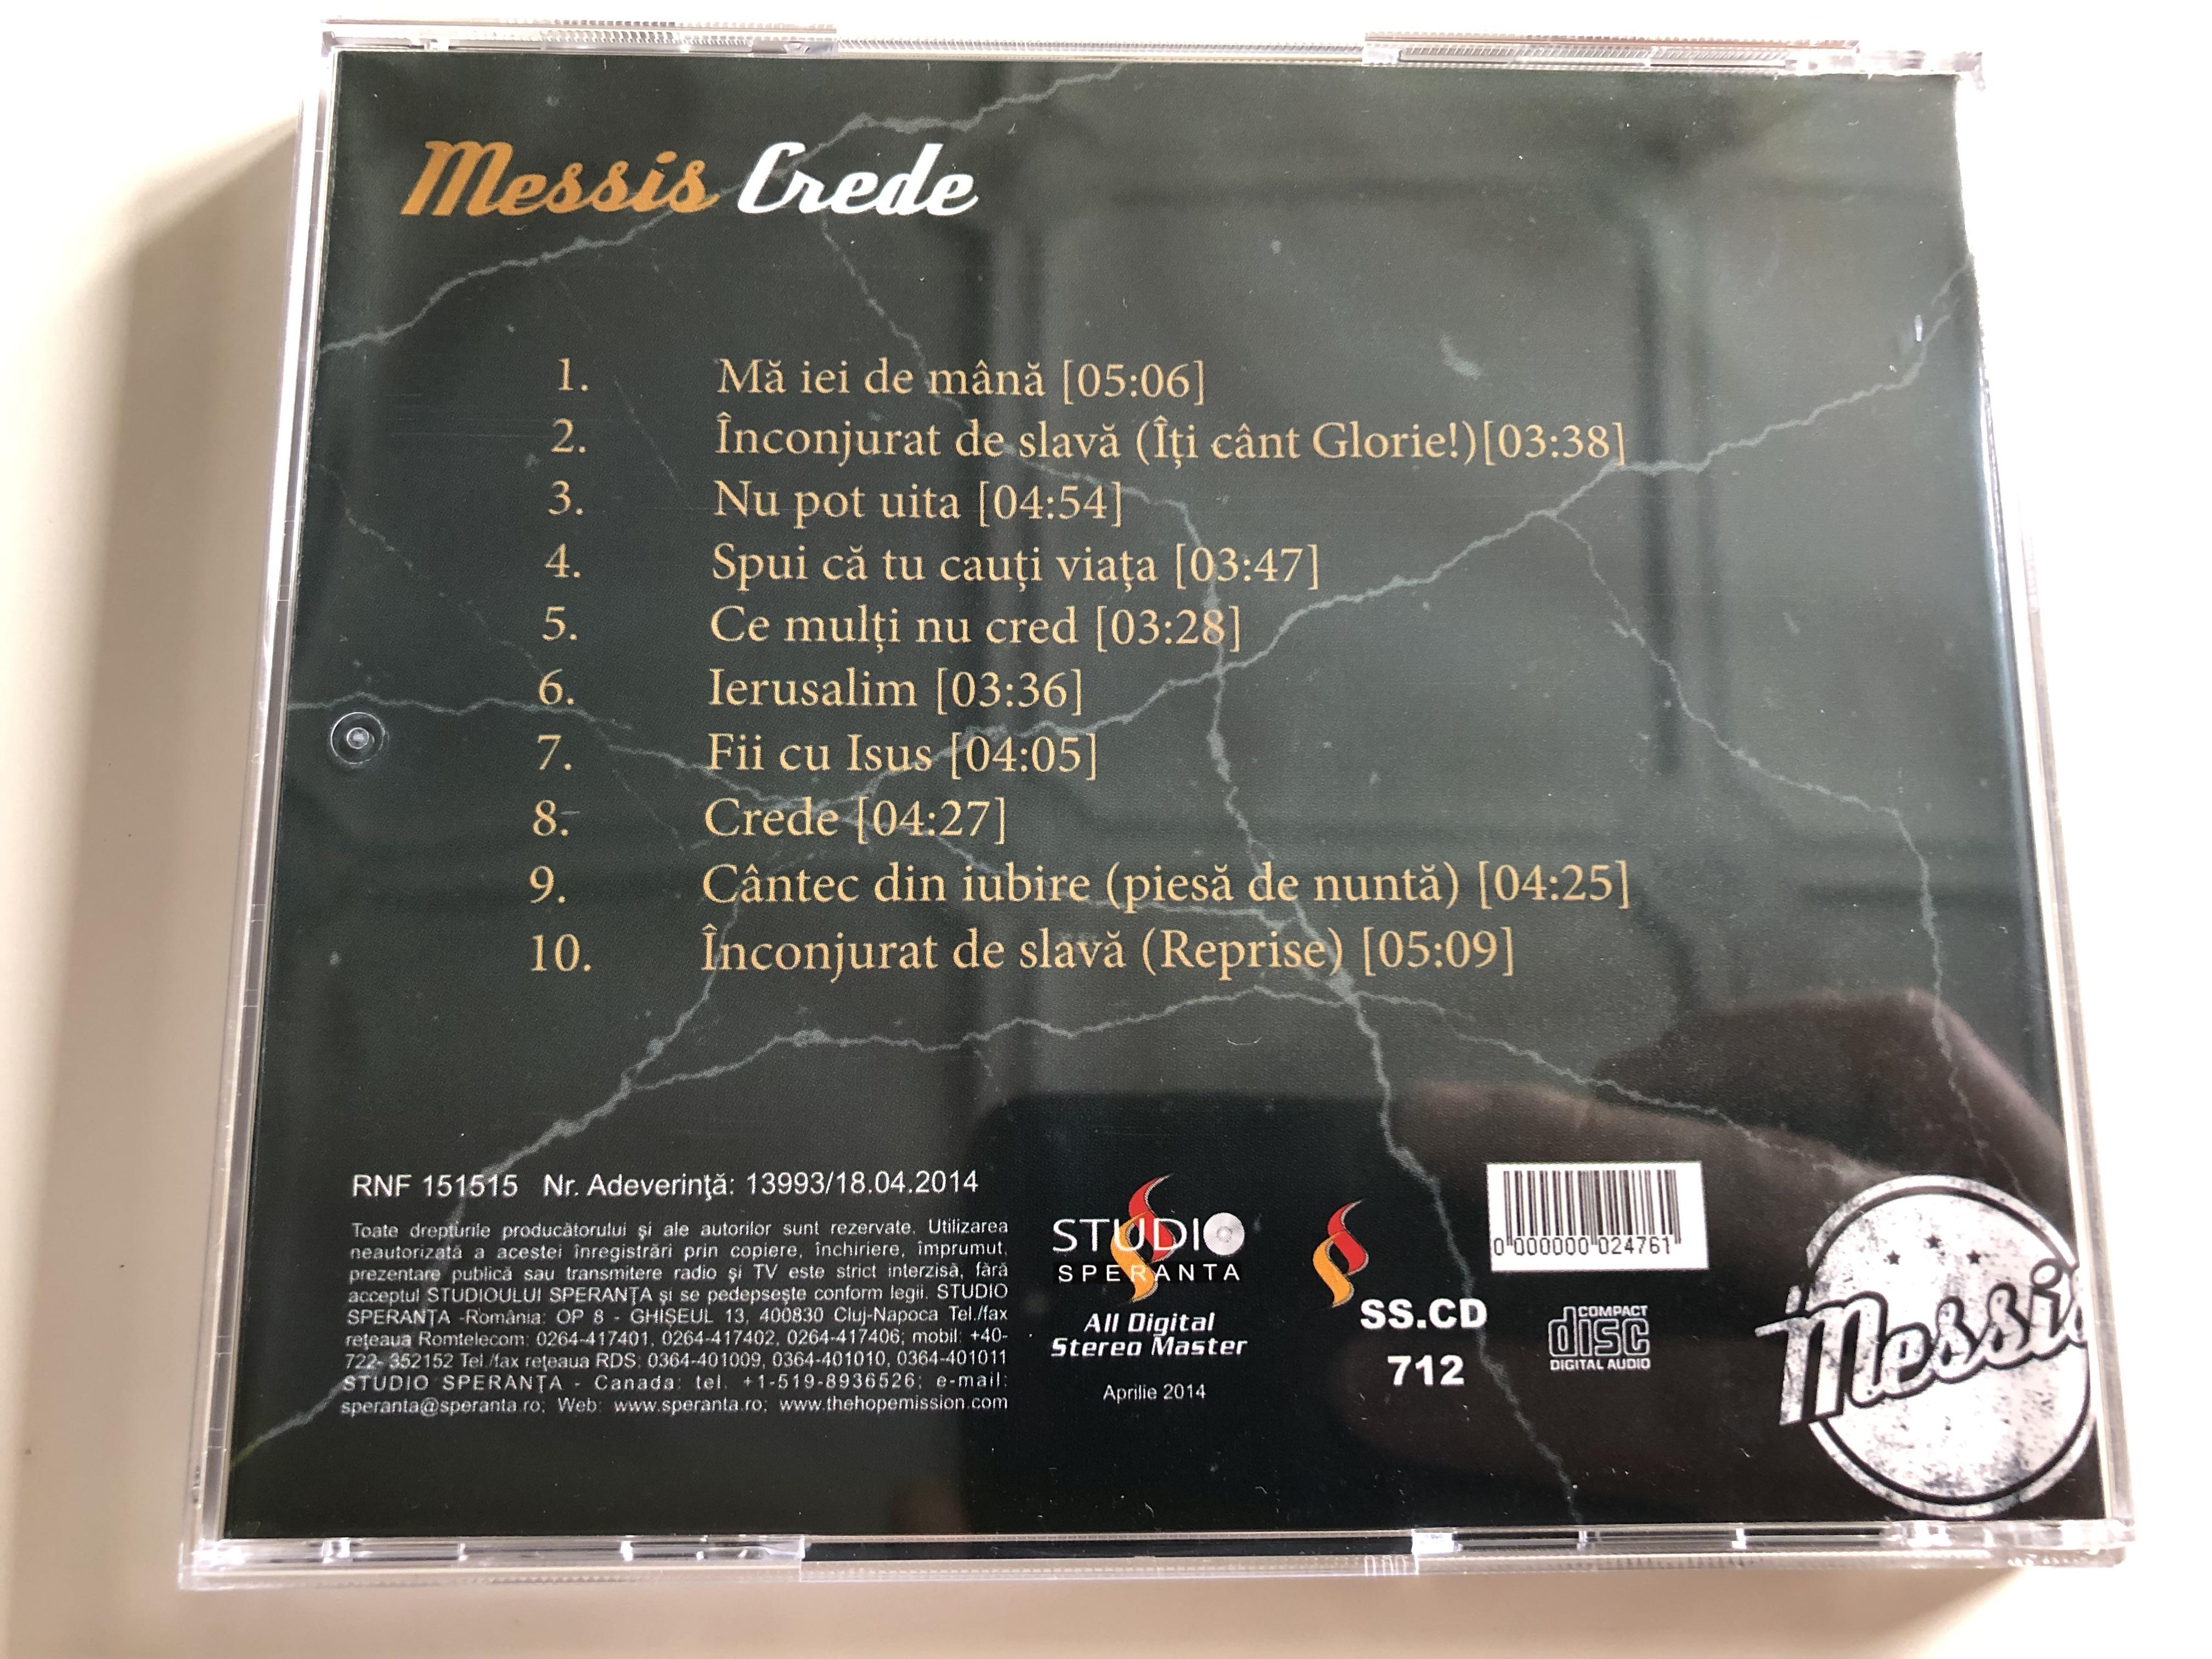 crede-messis-romanian-christian-worship-music-audio-cd-2014-ss.cd-712-6-.jpg